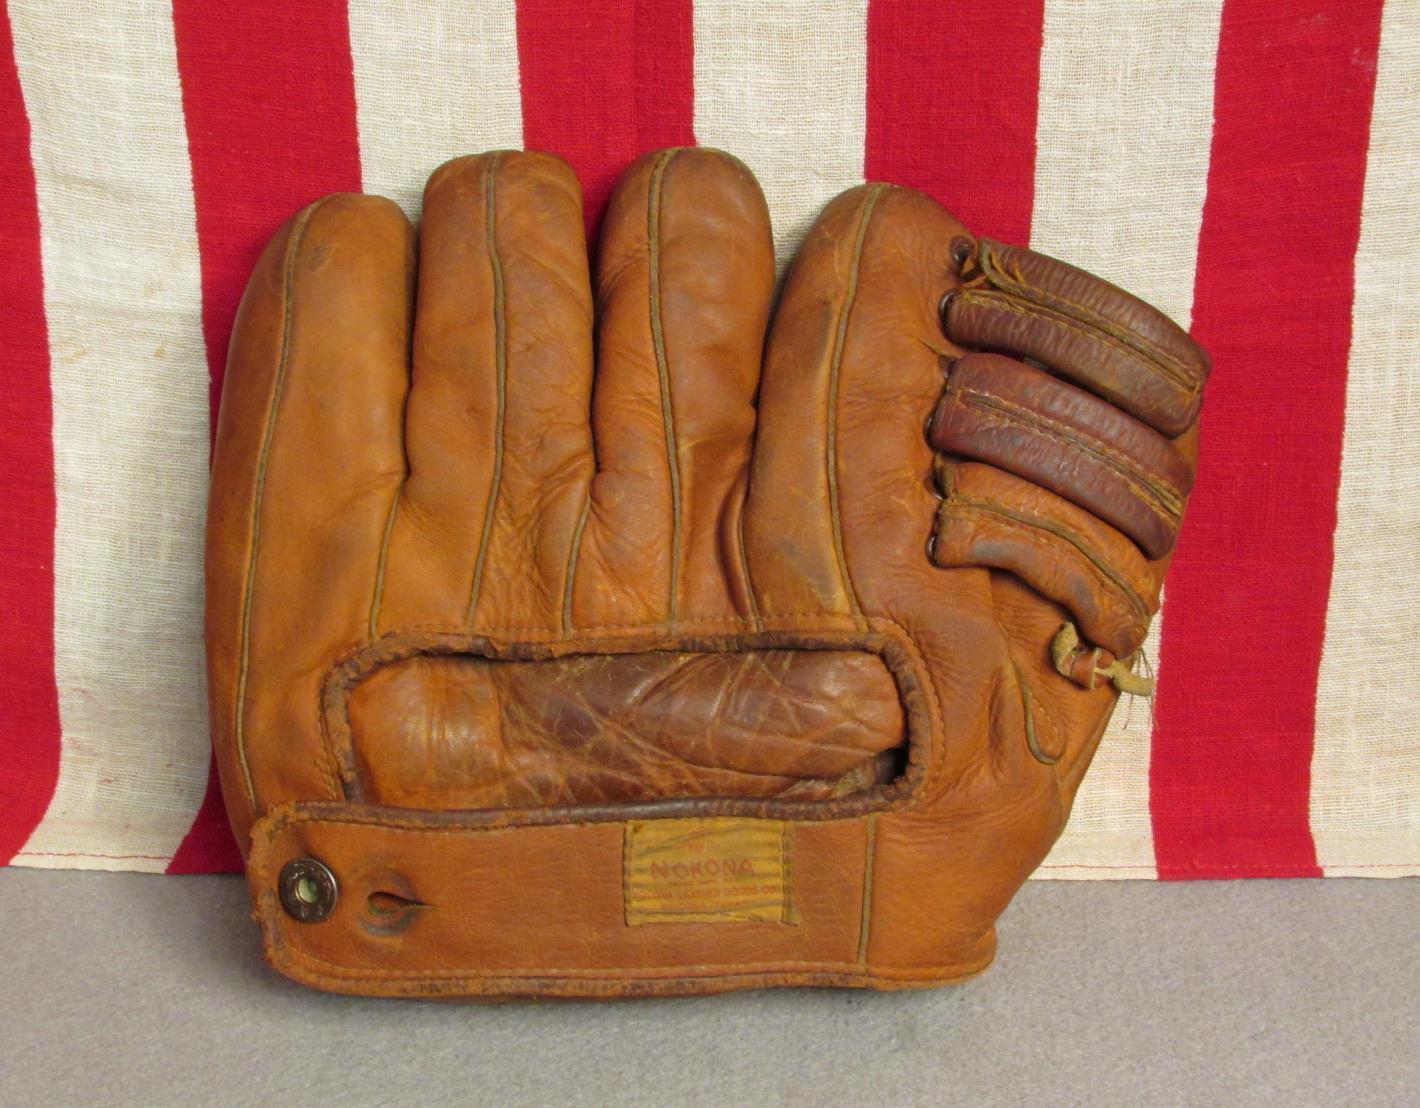 Vintage 1940s Jahre Nokona Leder Leder Leder Baseball Handschuh Fänger Mitt Ff Kreuz Sieht 7c21d6